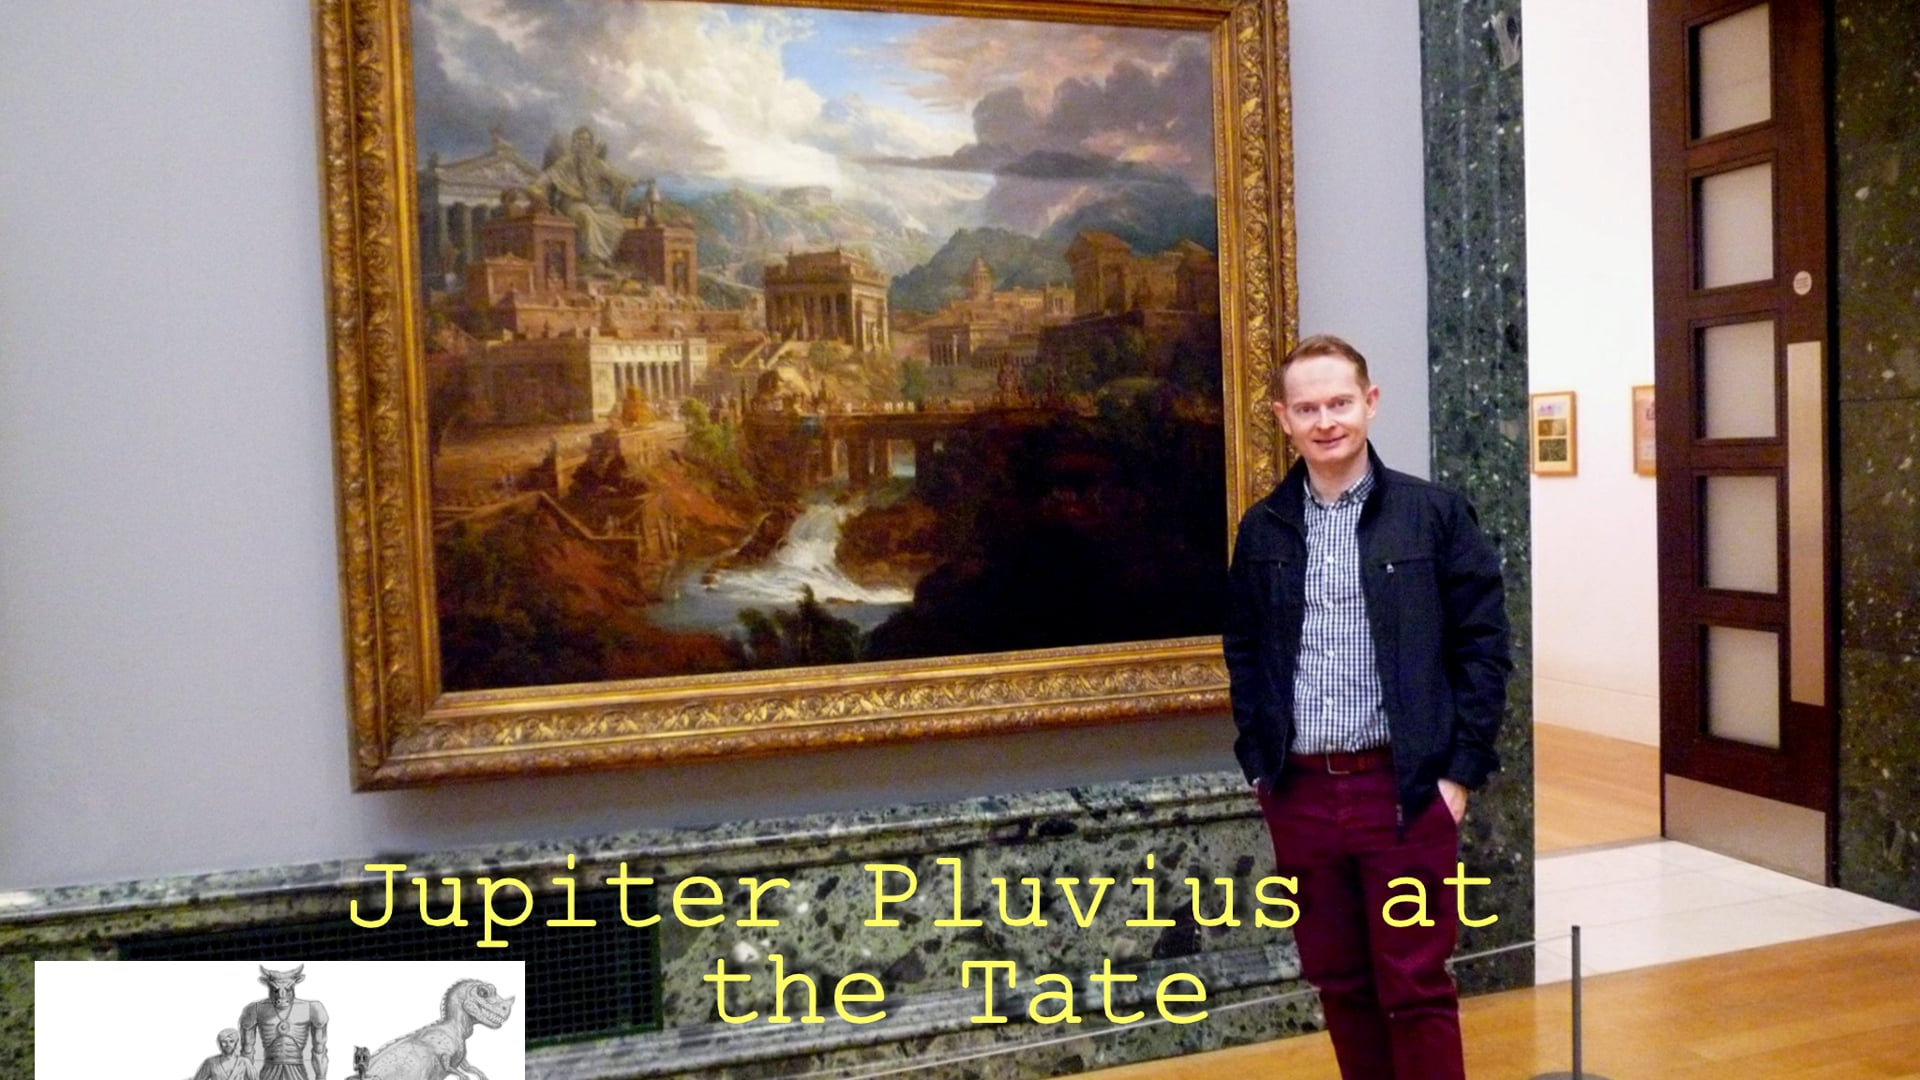 Ray Harryhausen- 'Jupiter Pluvius' at Tate Britain